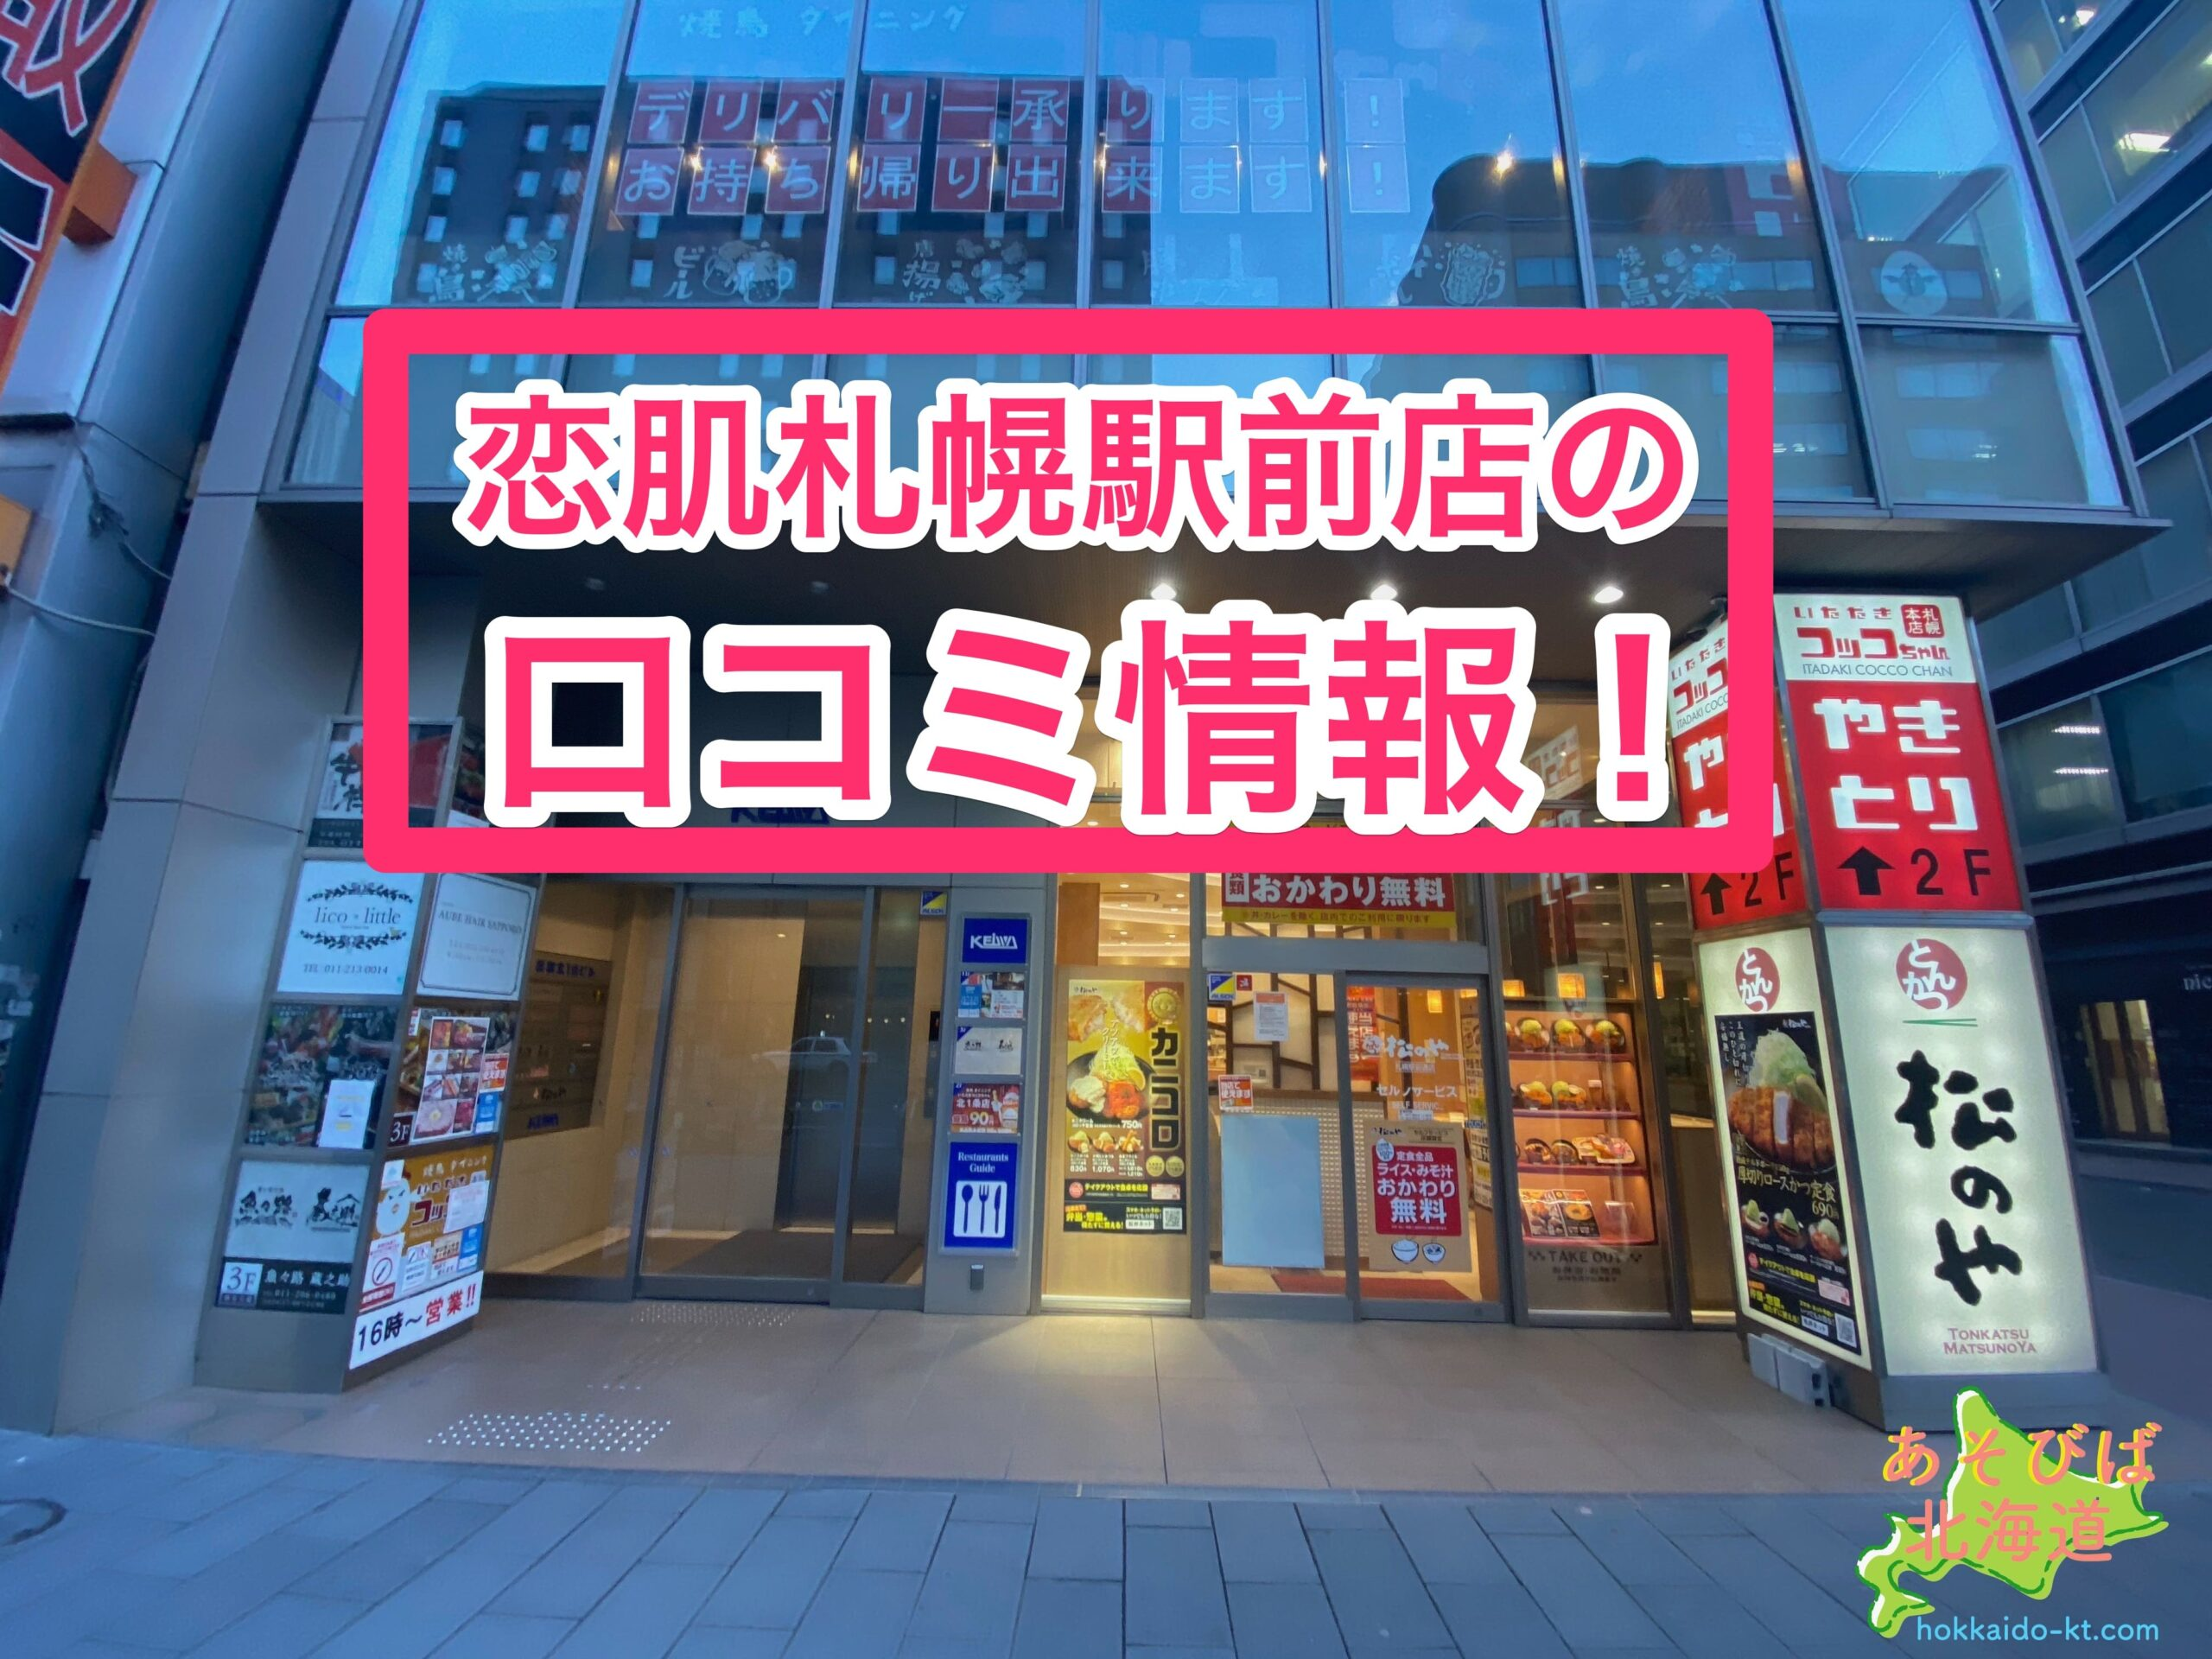 恋肌札幌駅前店の口コミ情報